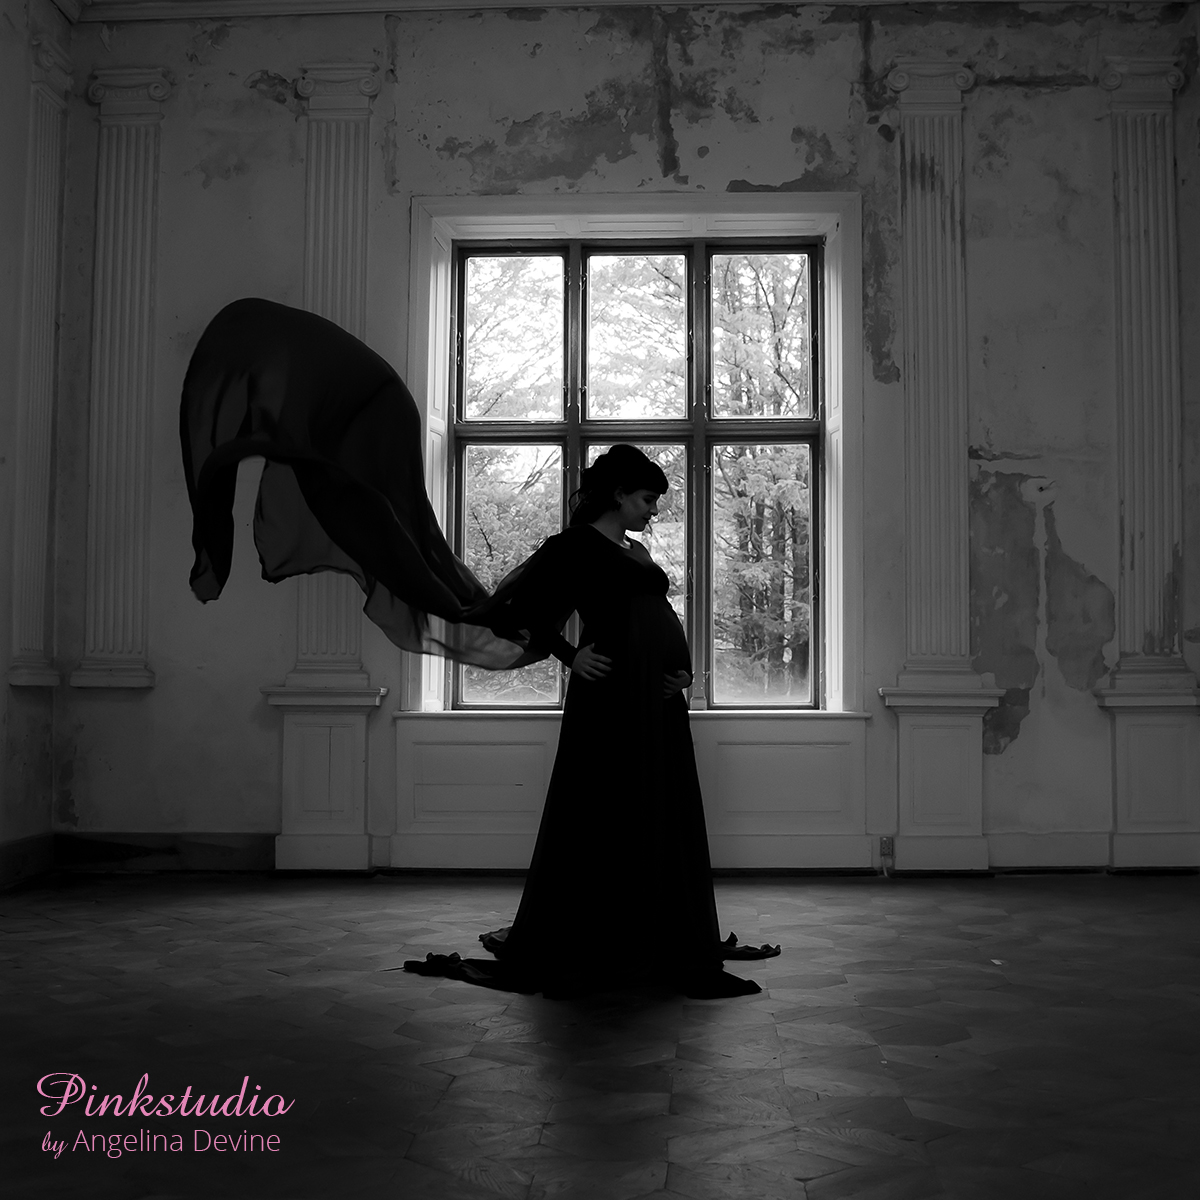 Pinkstudio by Angelina Devine Rebecca-279 Eksklusive portrætter